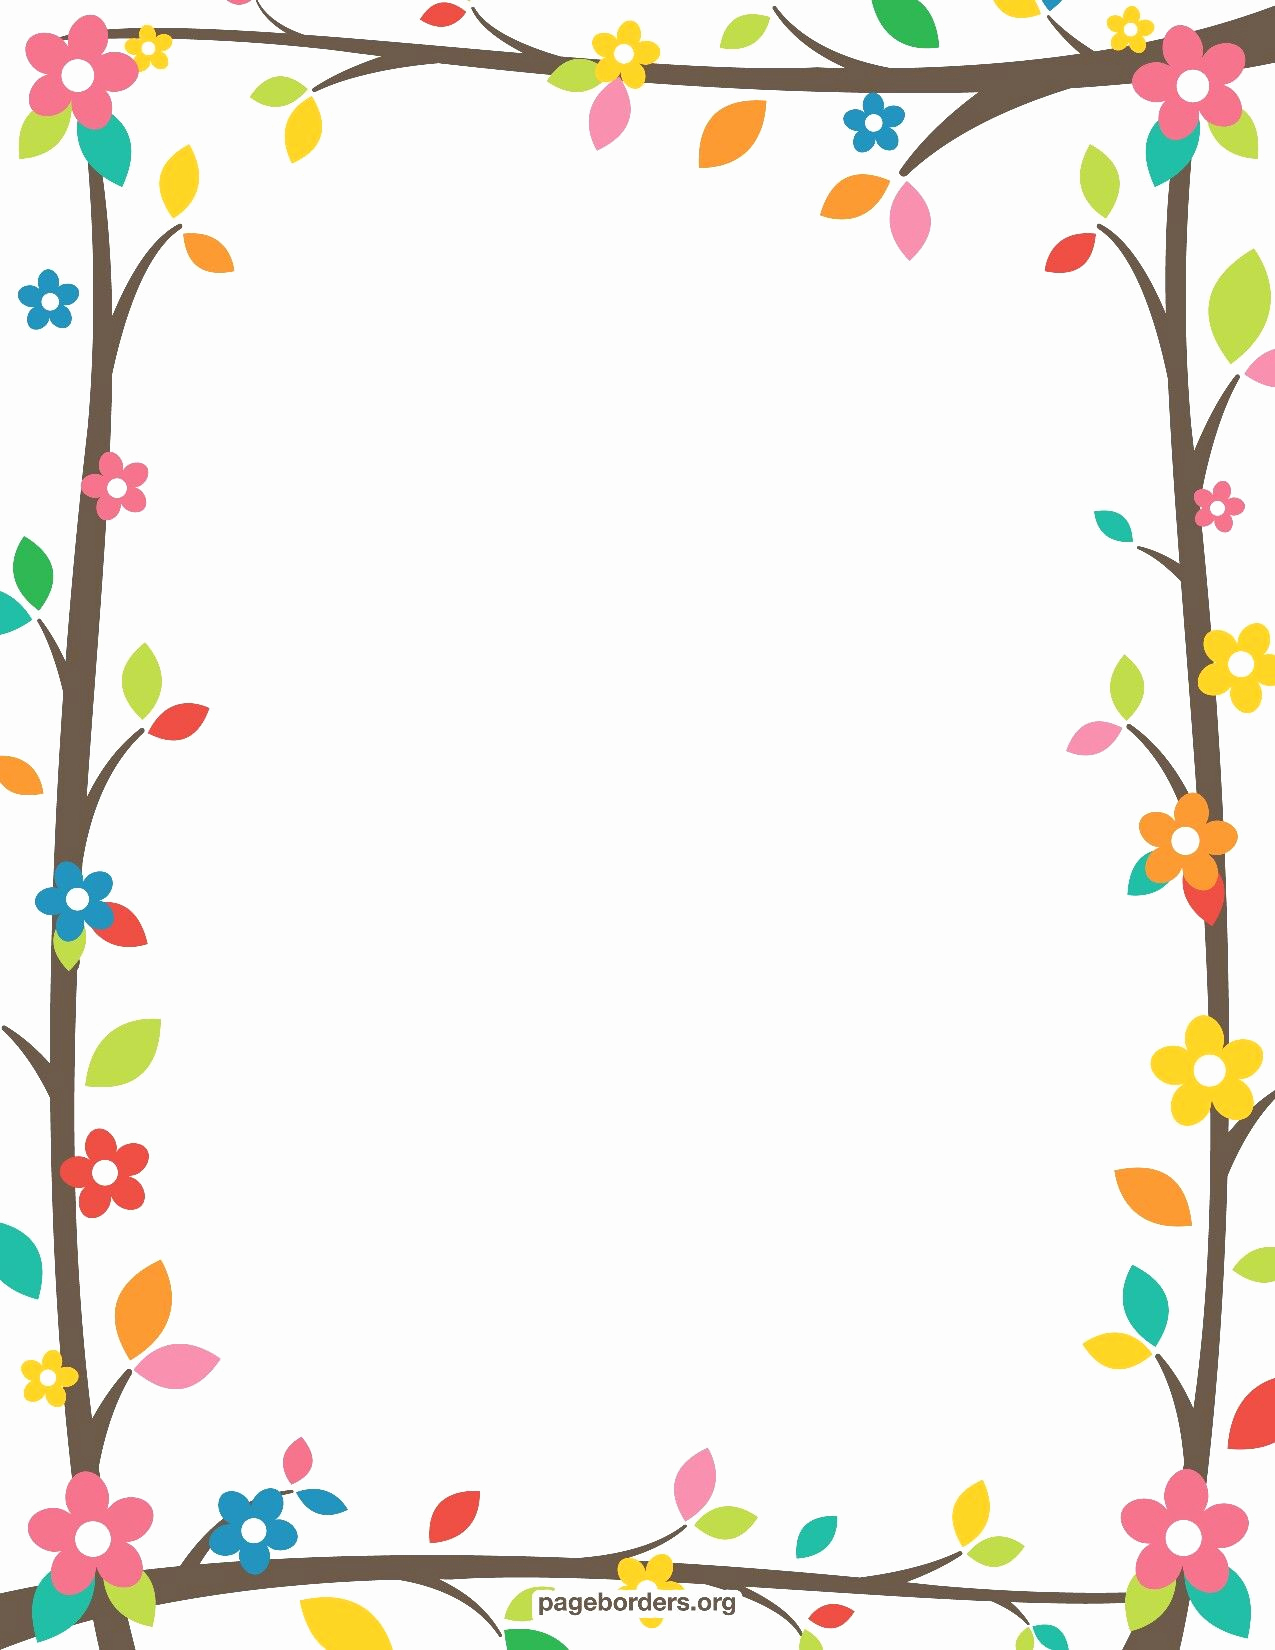 Free Printable Letterhead Borders Pin성원 전 On 칠교 Pinterest - Free Printable Letterhead Borders